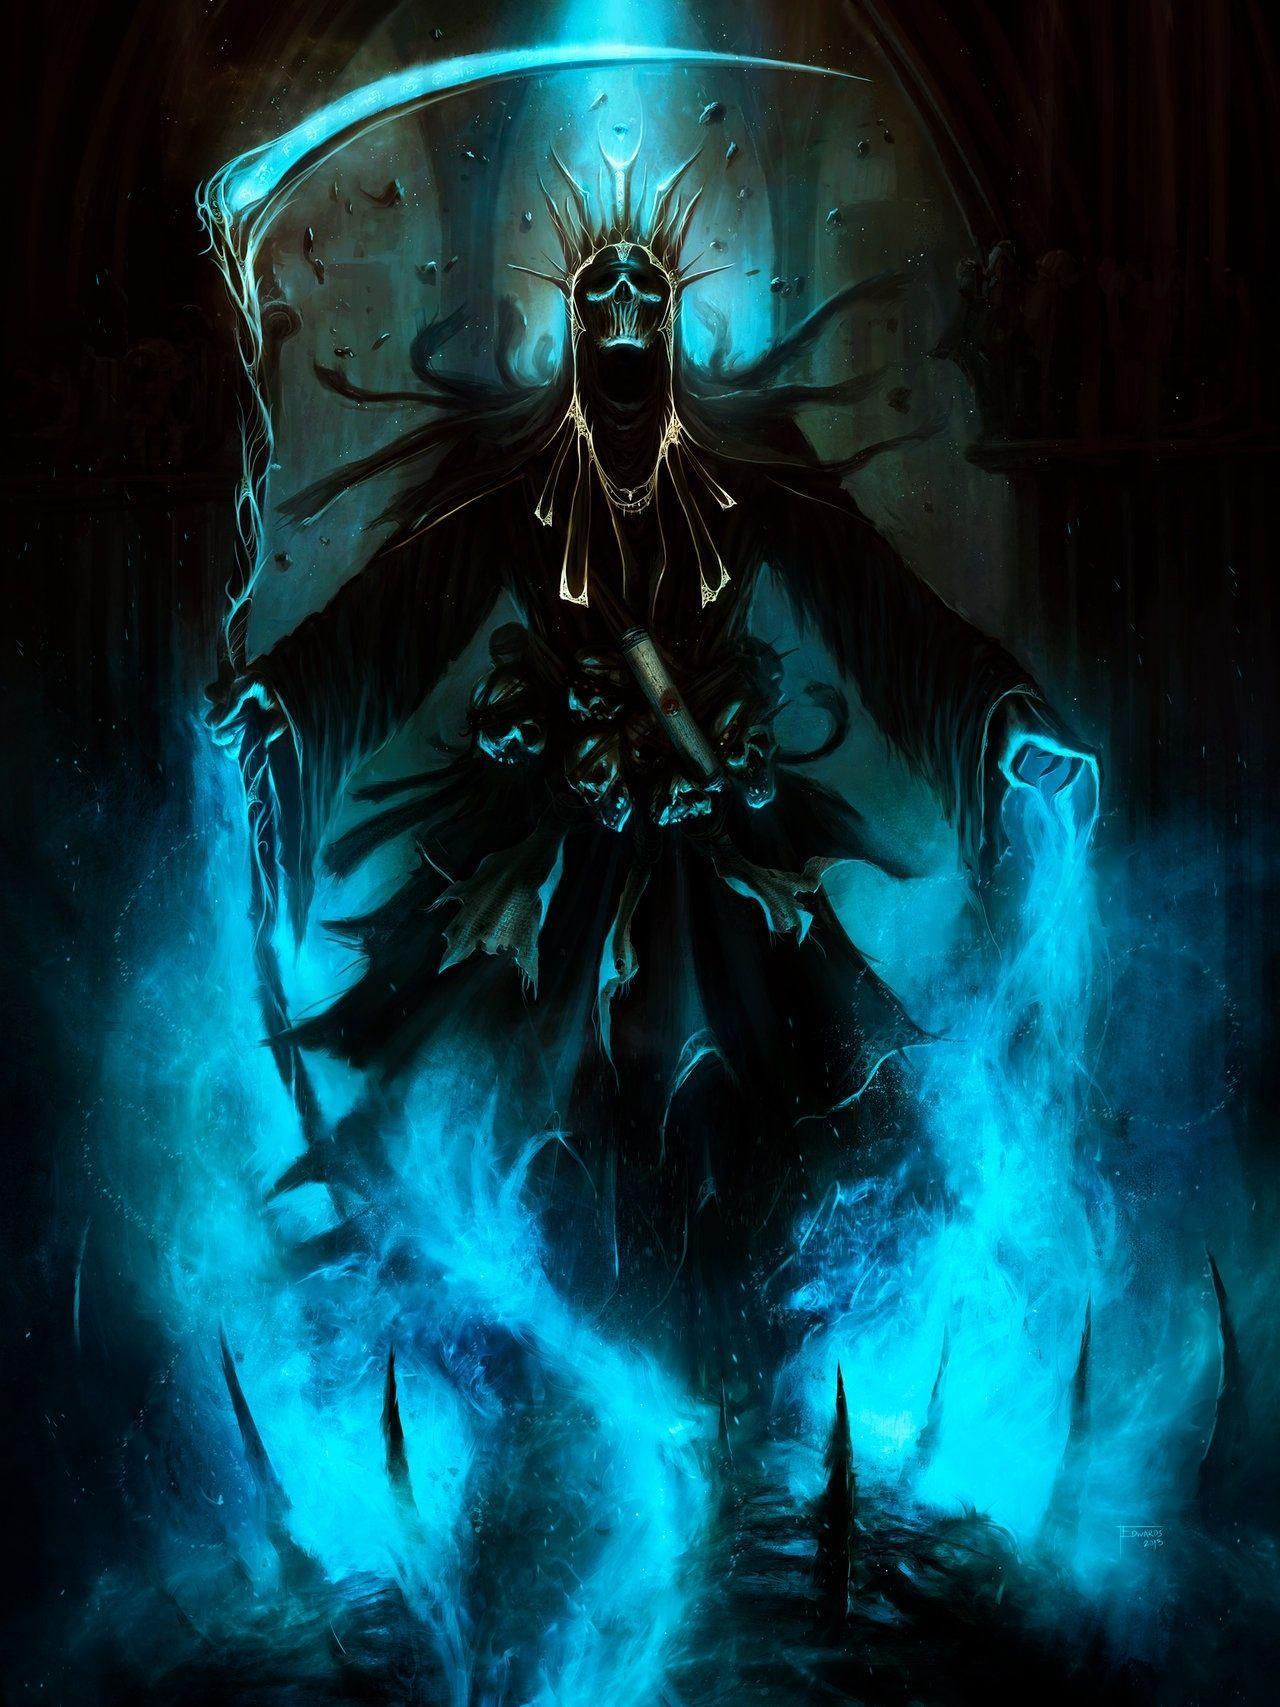 Wallpapers Grim Reaper Hd Wallpaper Cave